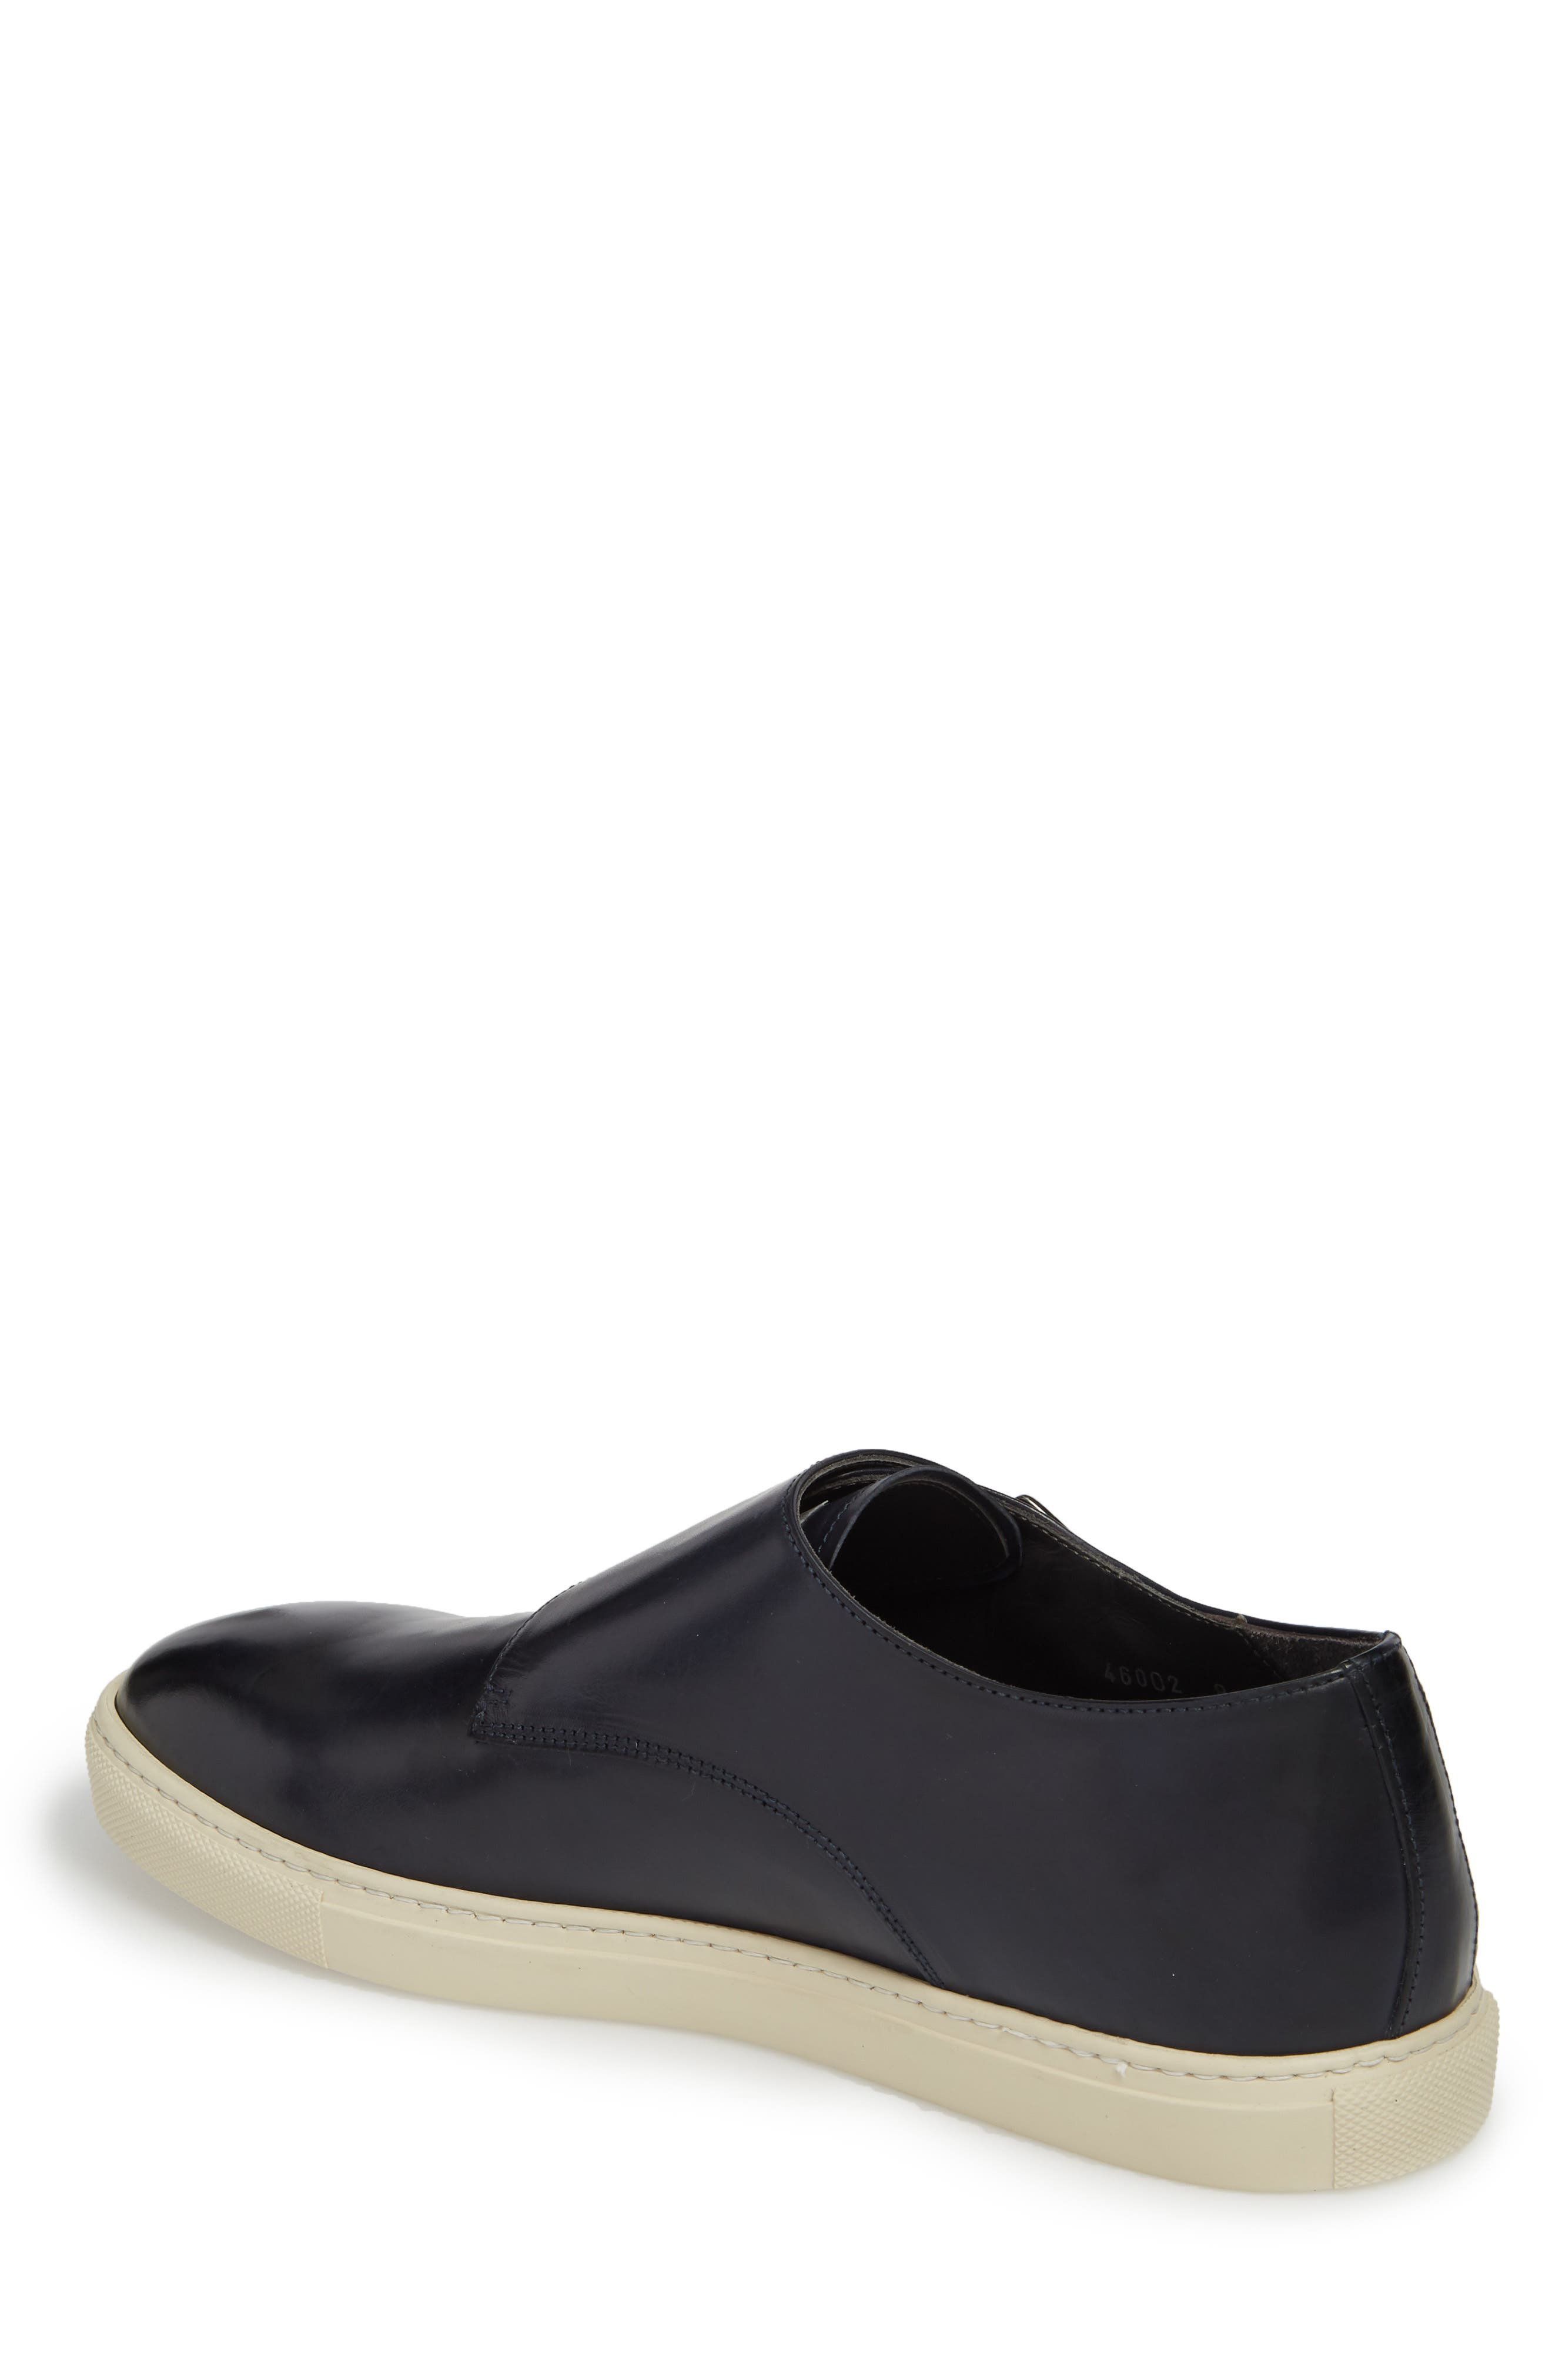 Gildden Double Monk Strap Sneaker,                             Alternate thumbnail 2, color,                             400